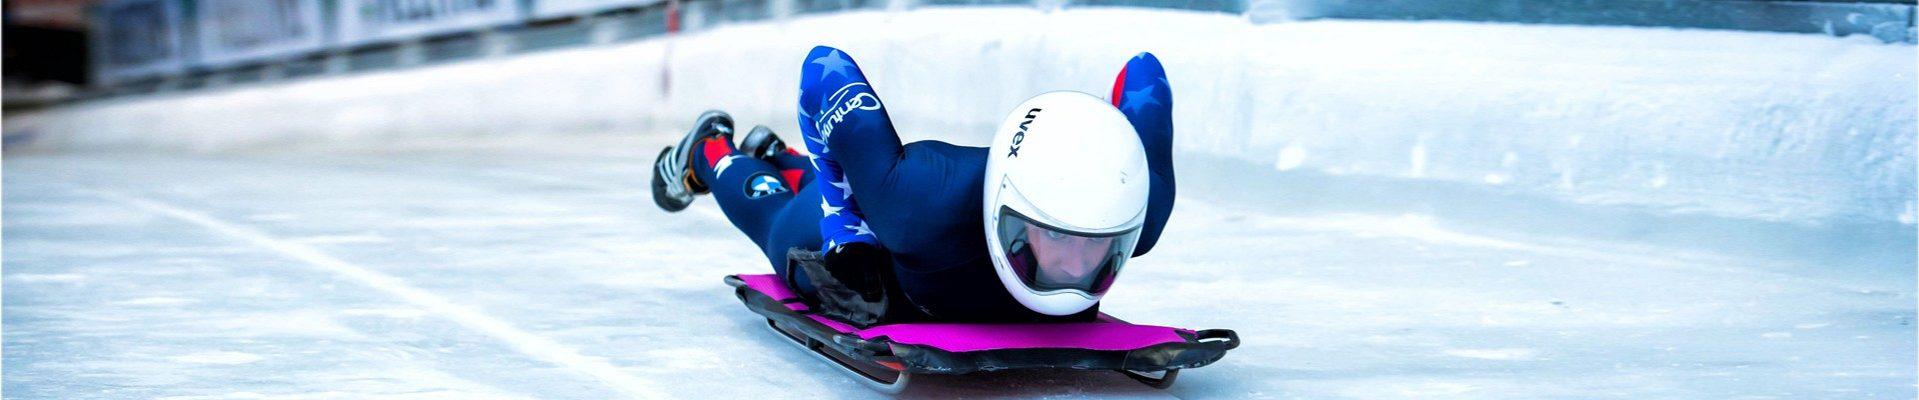 Skeletonfahrer im Eiskanal - SPITZENSPORT fördern in NRW!